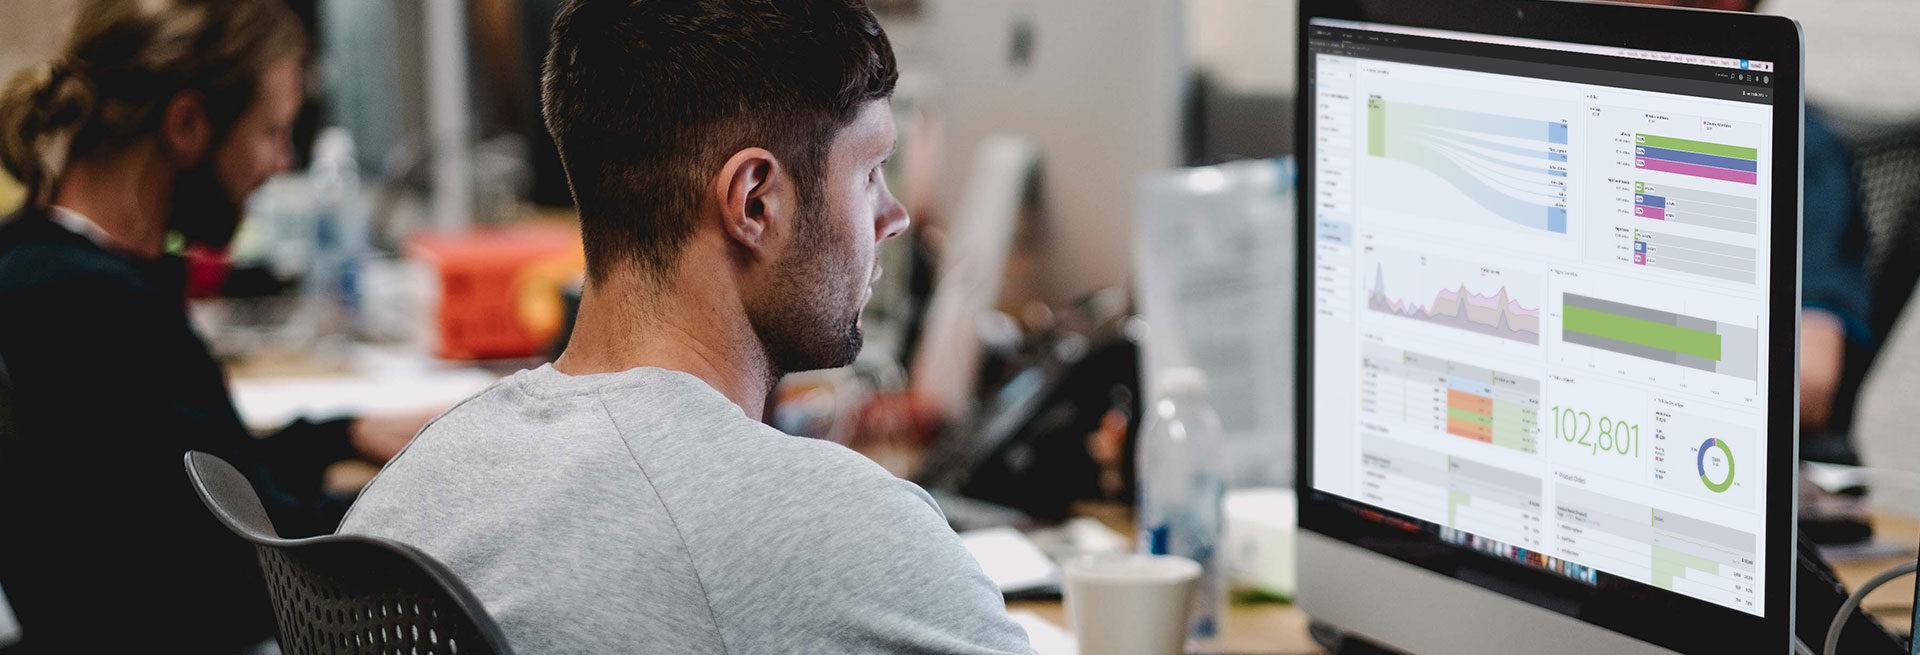 adobe analytics training header image